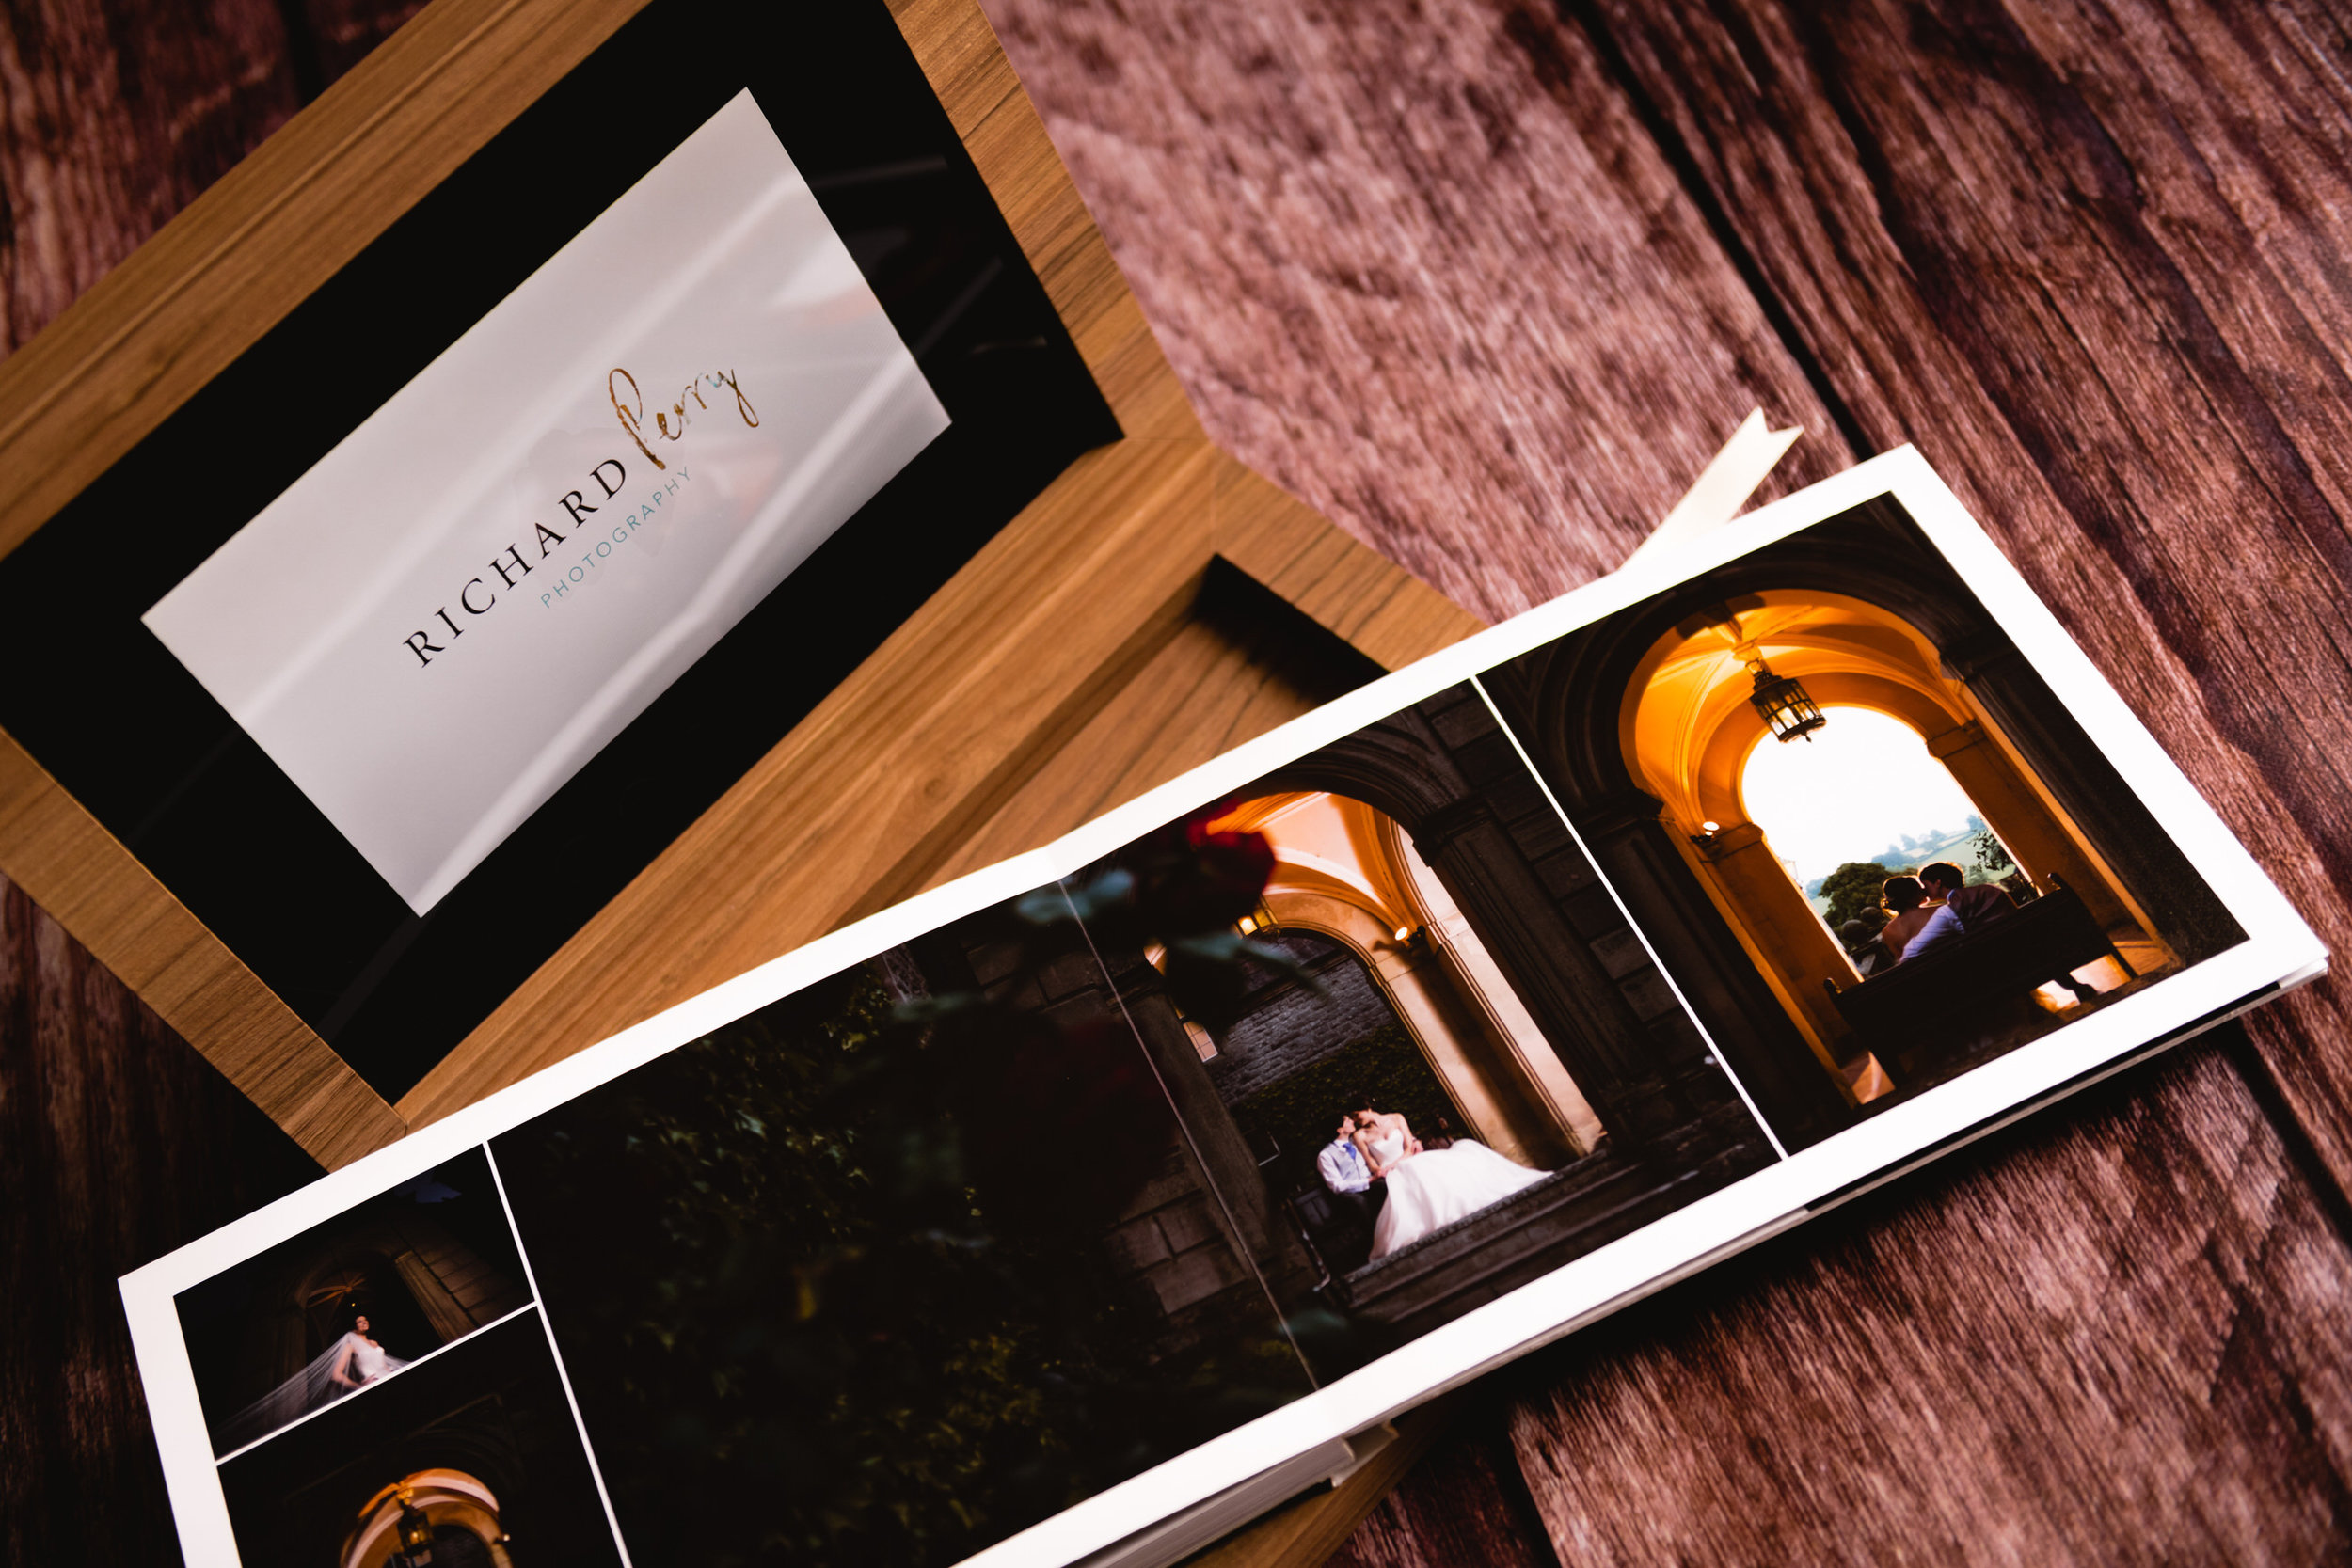 graphistudio-wedding-album-richard-perry-photography-14.jpg